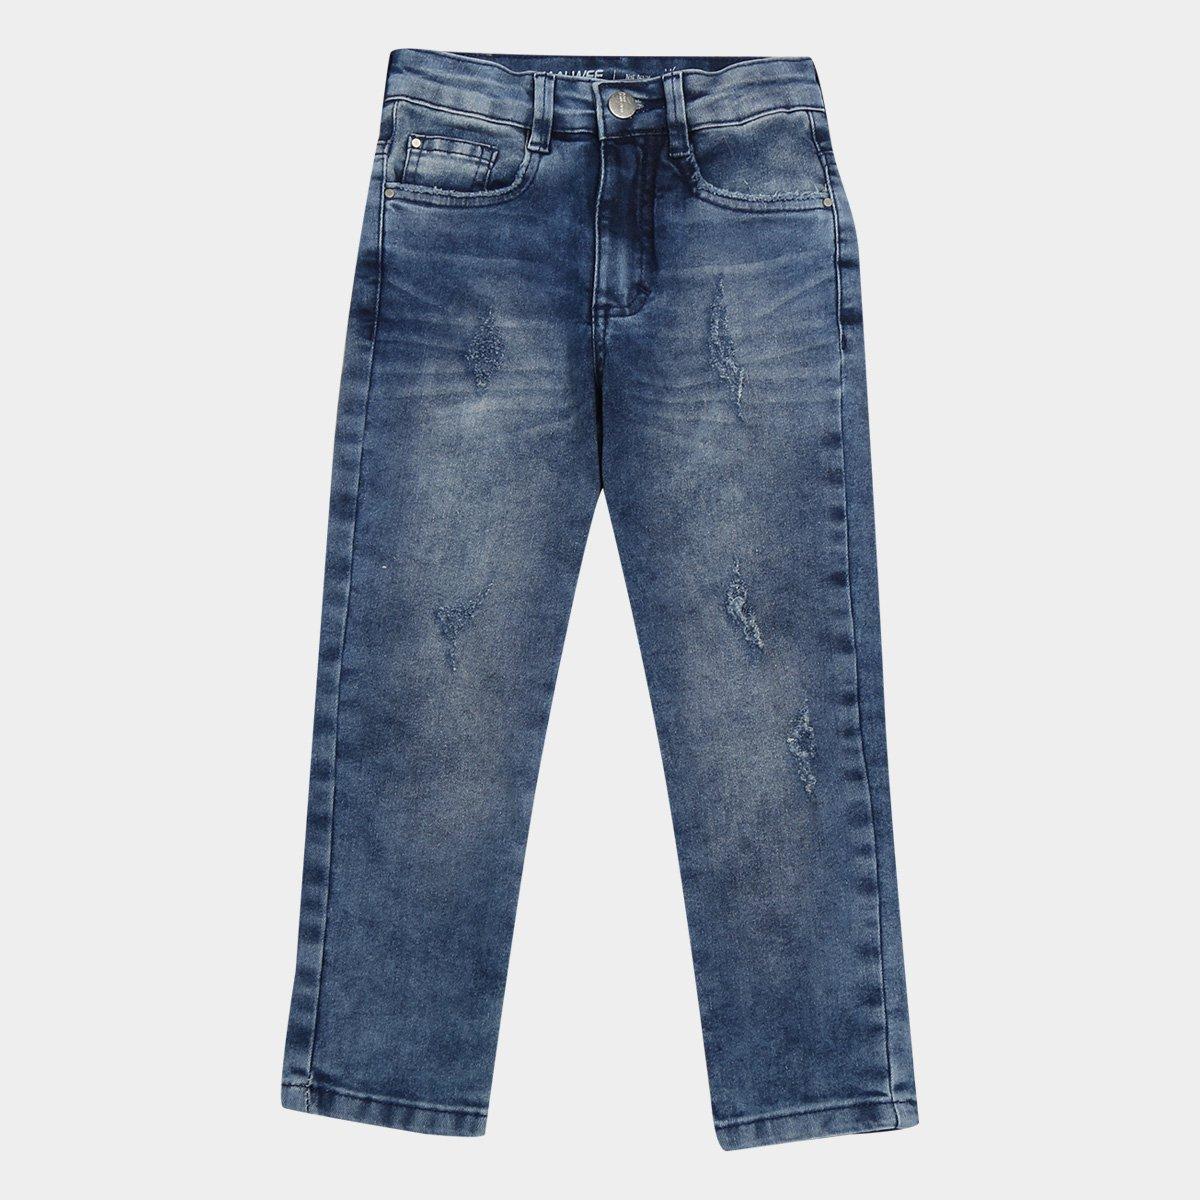 Calça Jeans Juvenil Malwee Skinny Estonada Masculina